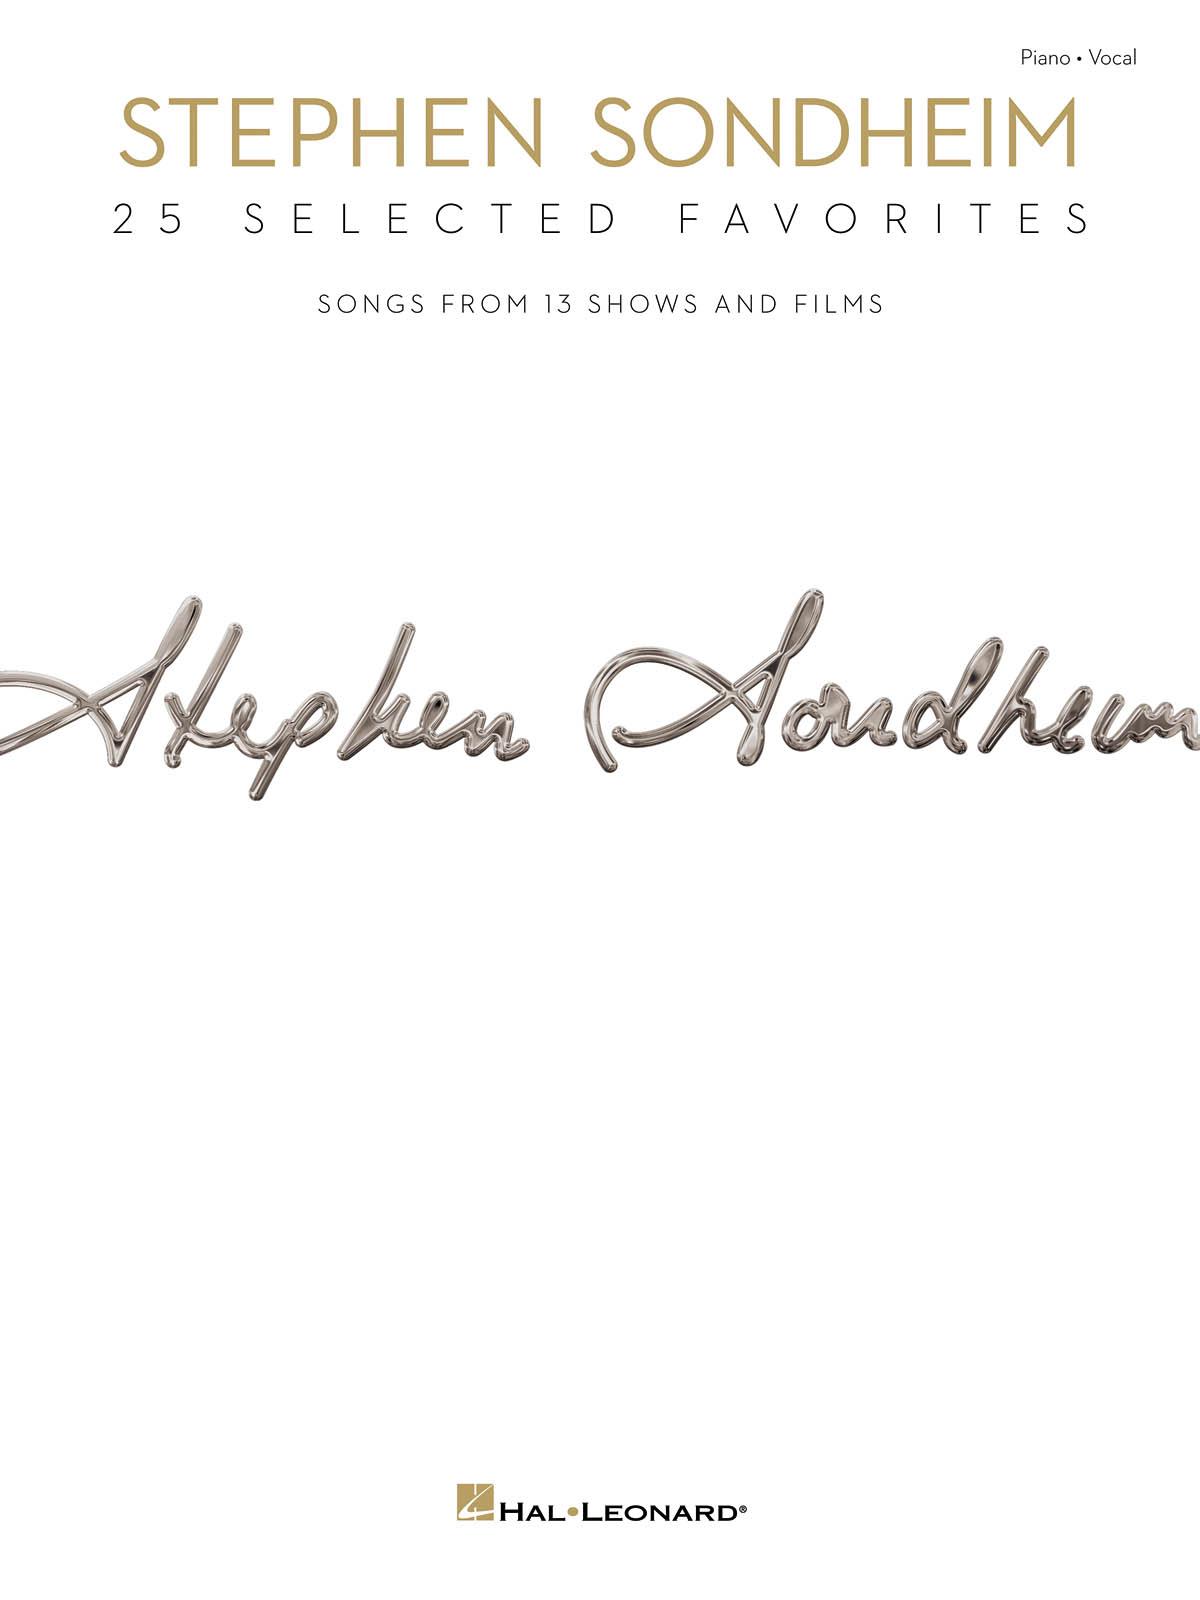 Stephen Sondheim: Stephen Sondheim - 25 Selected Favorites: Vocal and Piano: